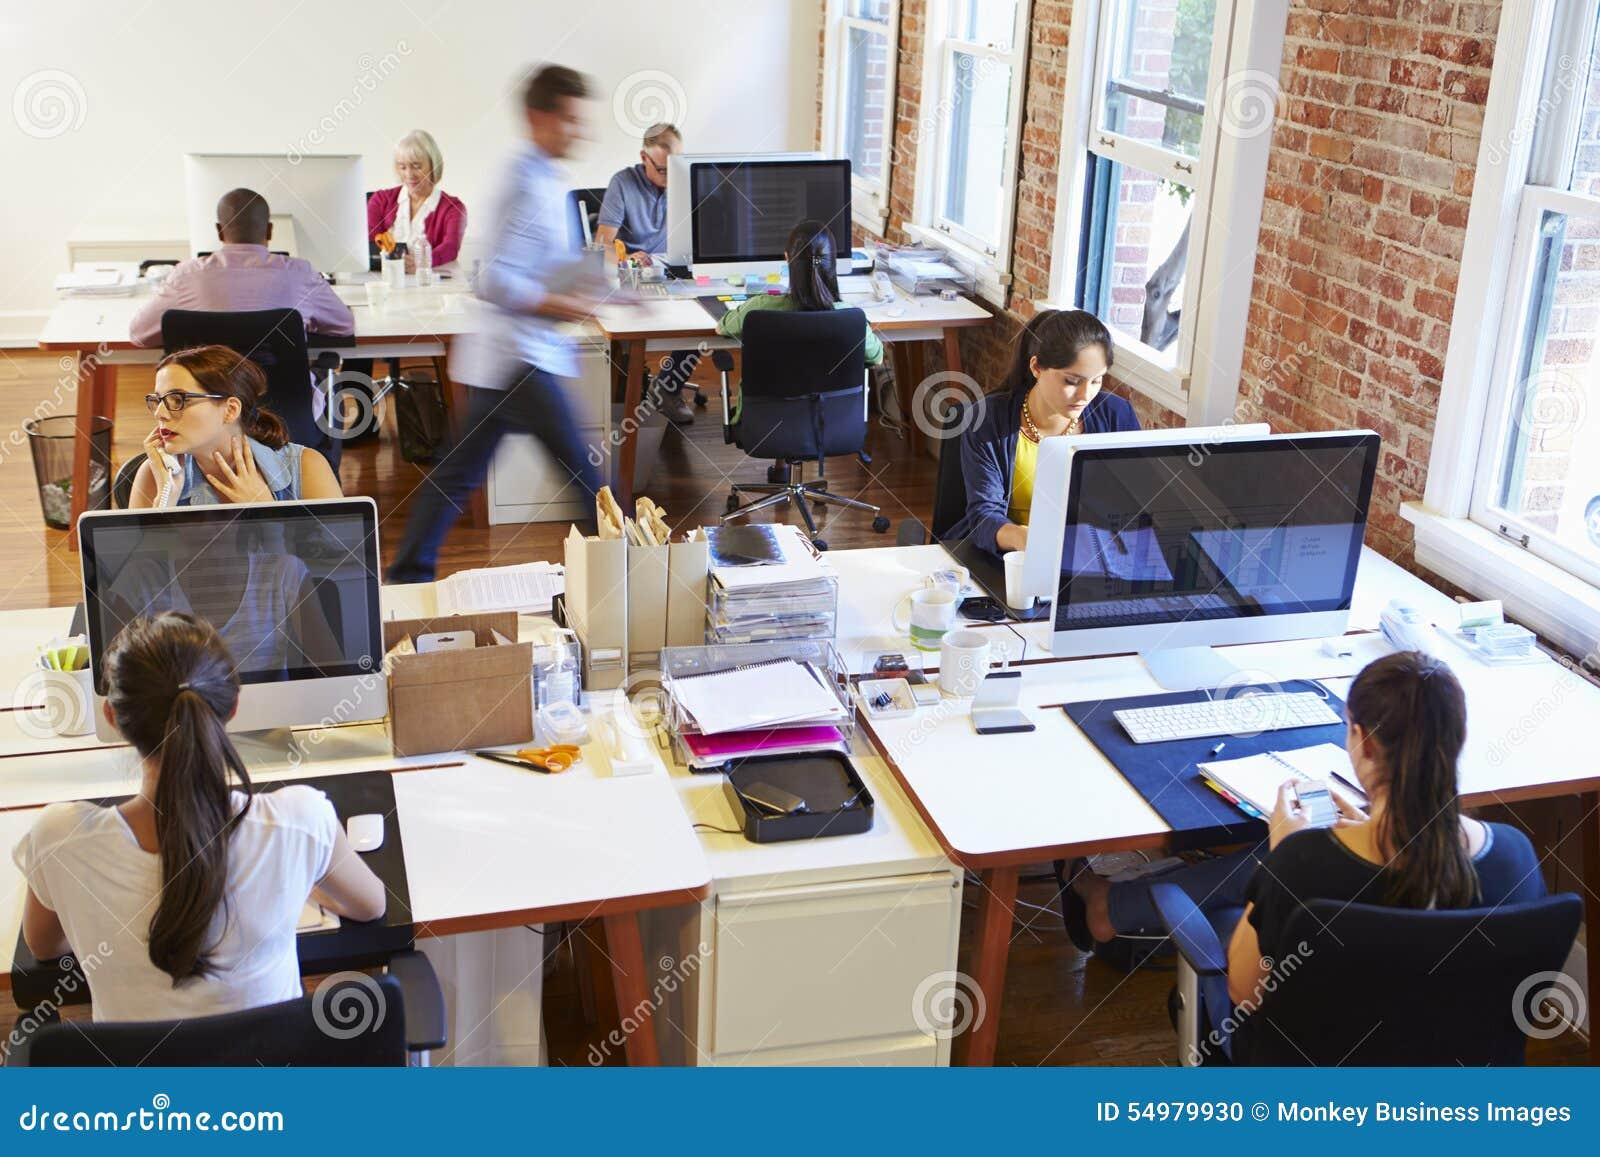 Bred vinkelsikt av det upptagna designkontoret med arbetare på skrivbord